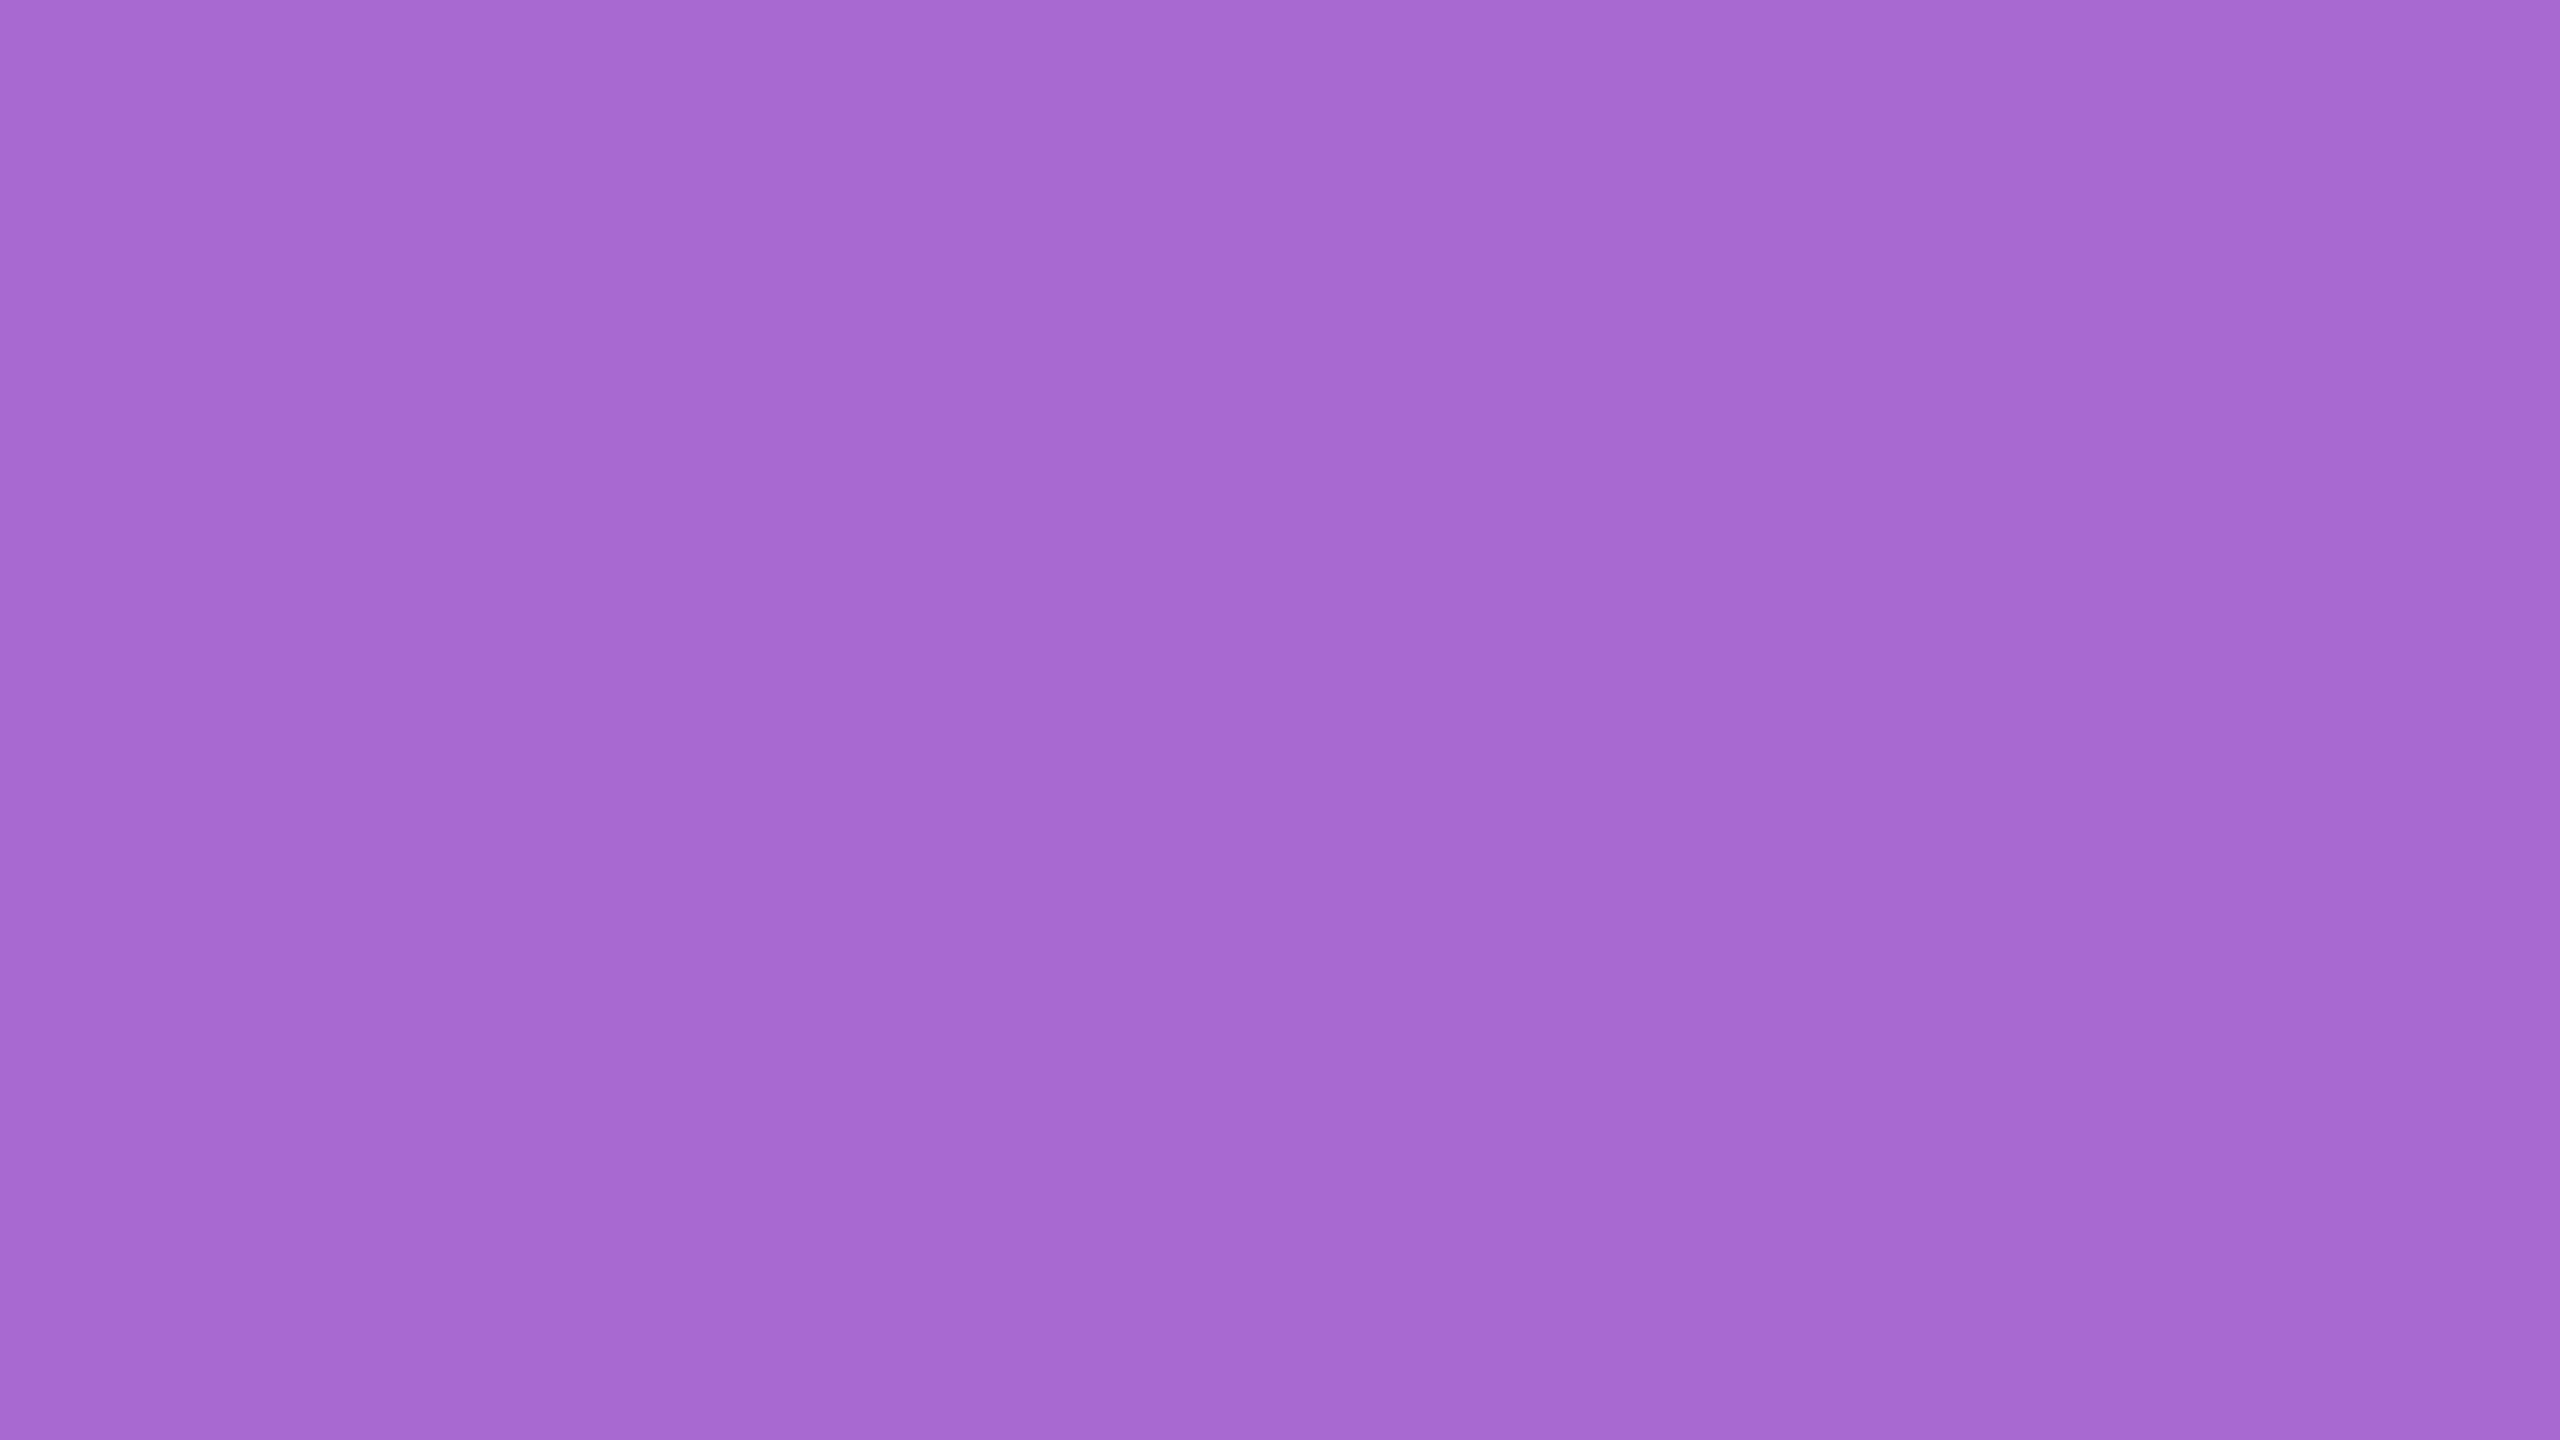 2560x1440 Rich Lavender Solid Color Background